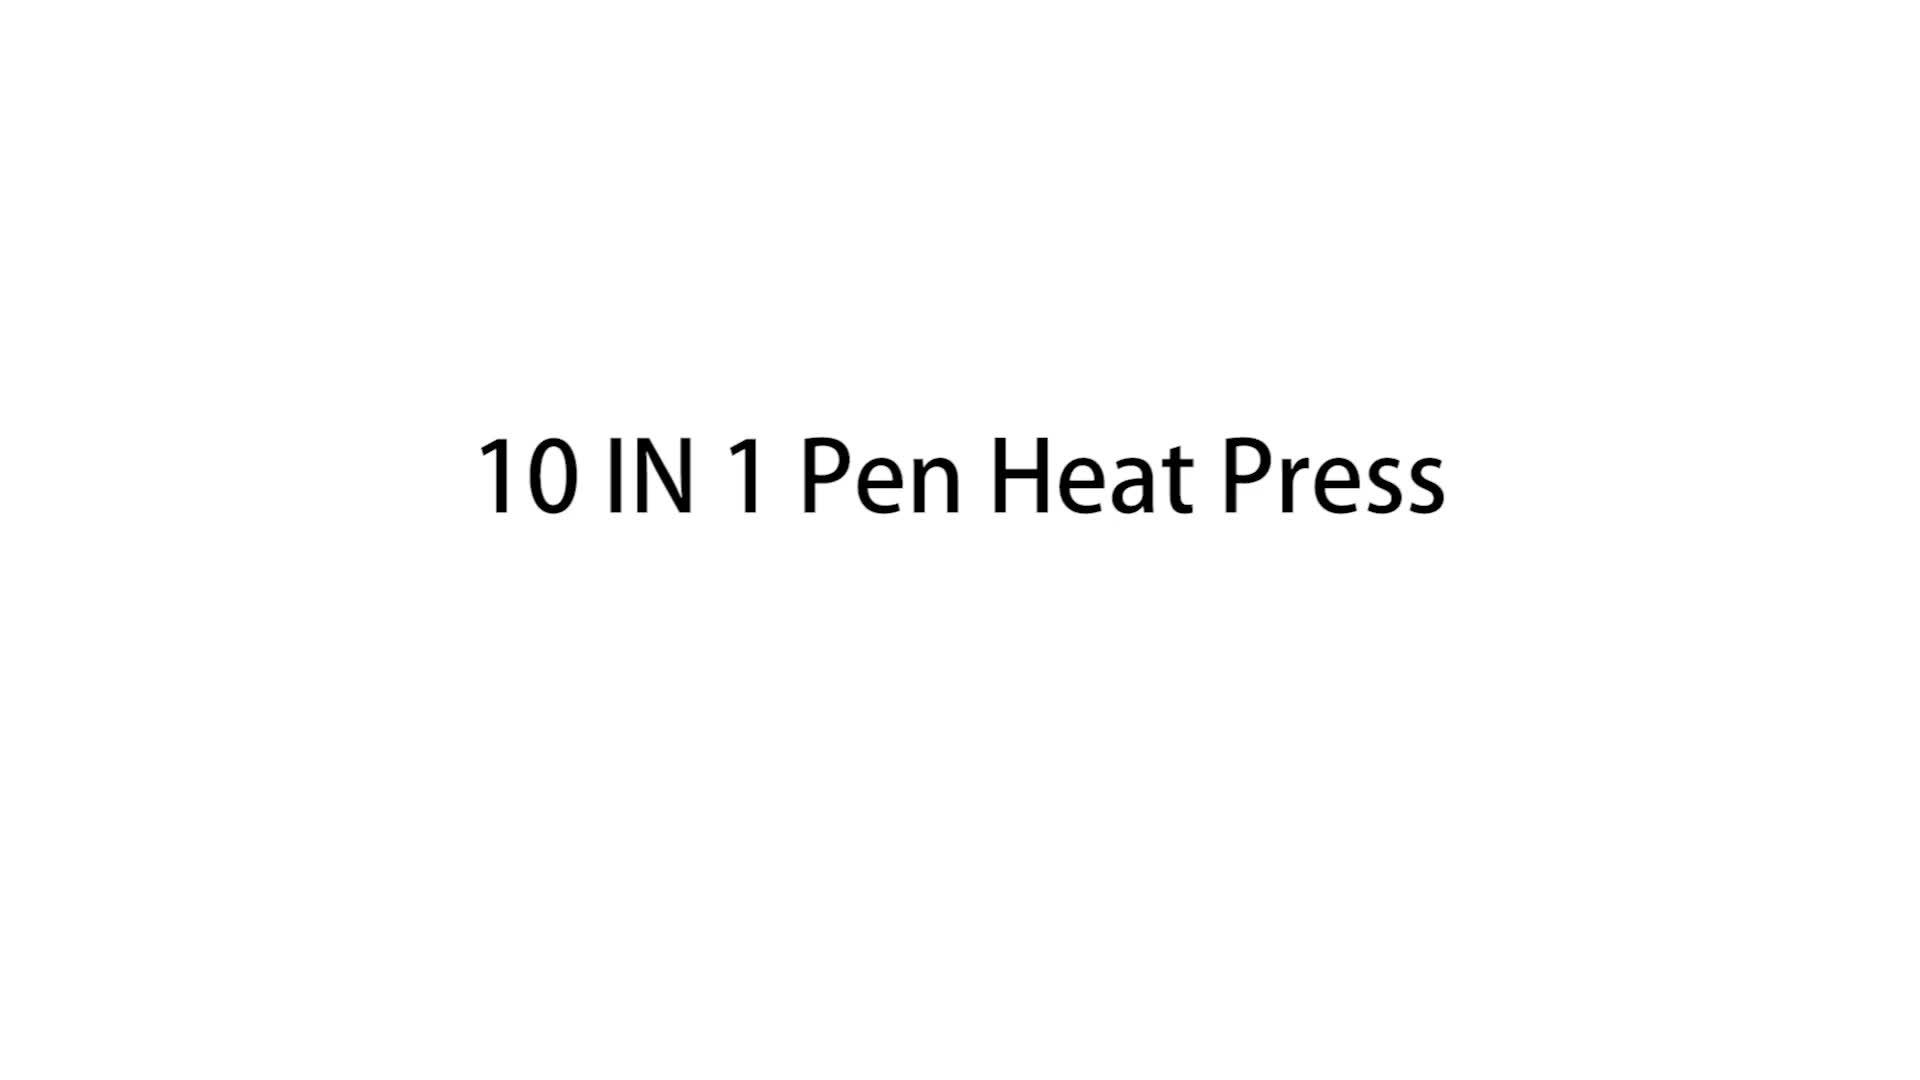 Factory Supply 10 Pen At One Time Heat Press Machine Heat Transfer Printing 10 Piece Pen Heat Press Making Machine